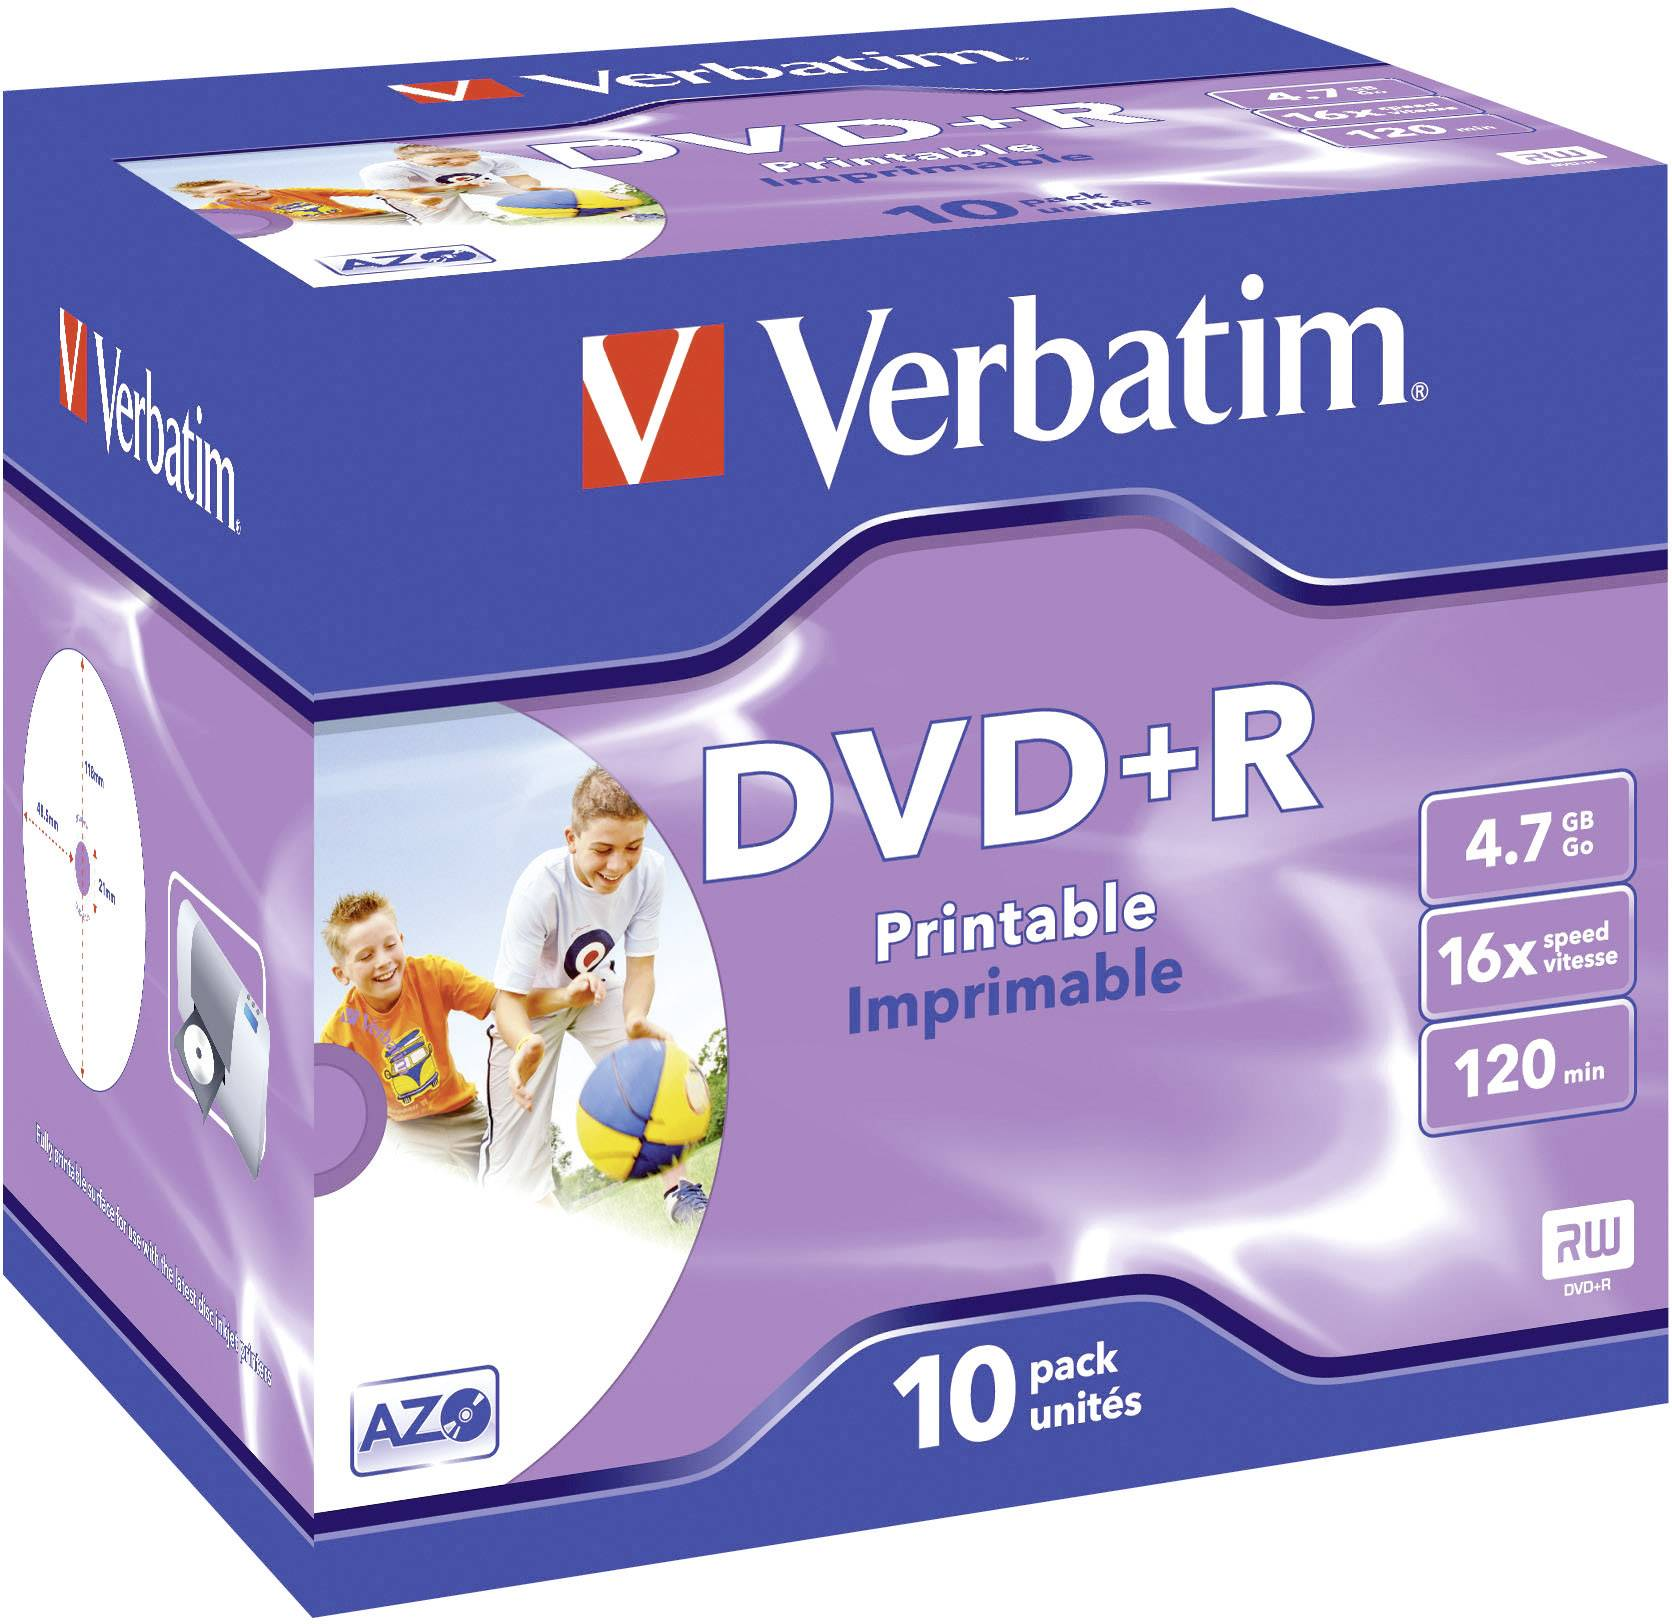 DVD+R 4.7 GB Verbatim 43508, možnosť potlače, 10 ks, Jewelcase